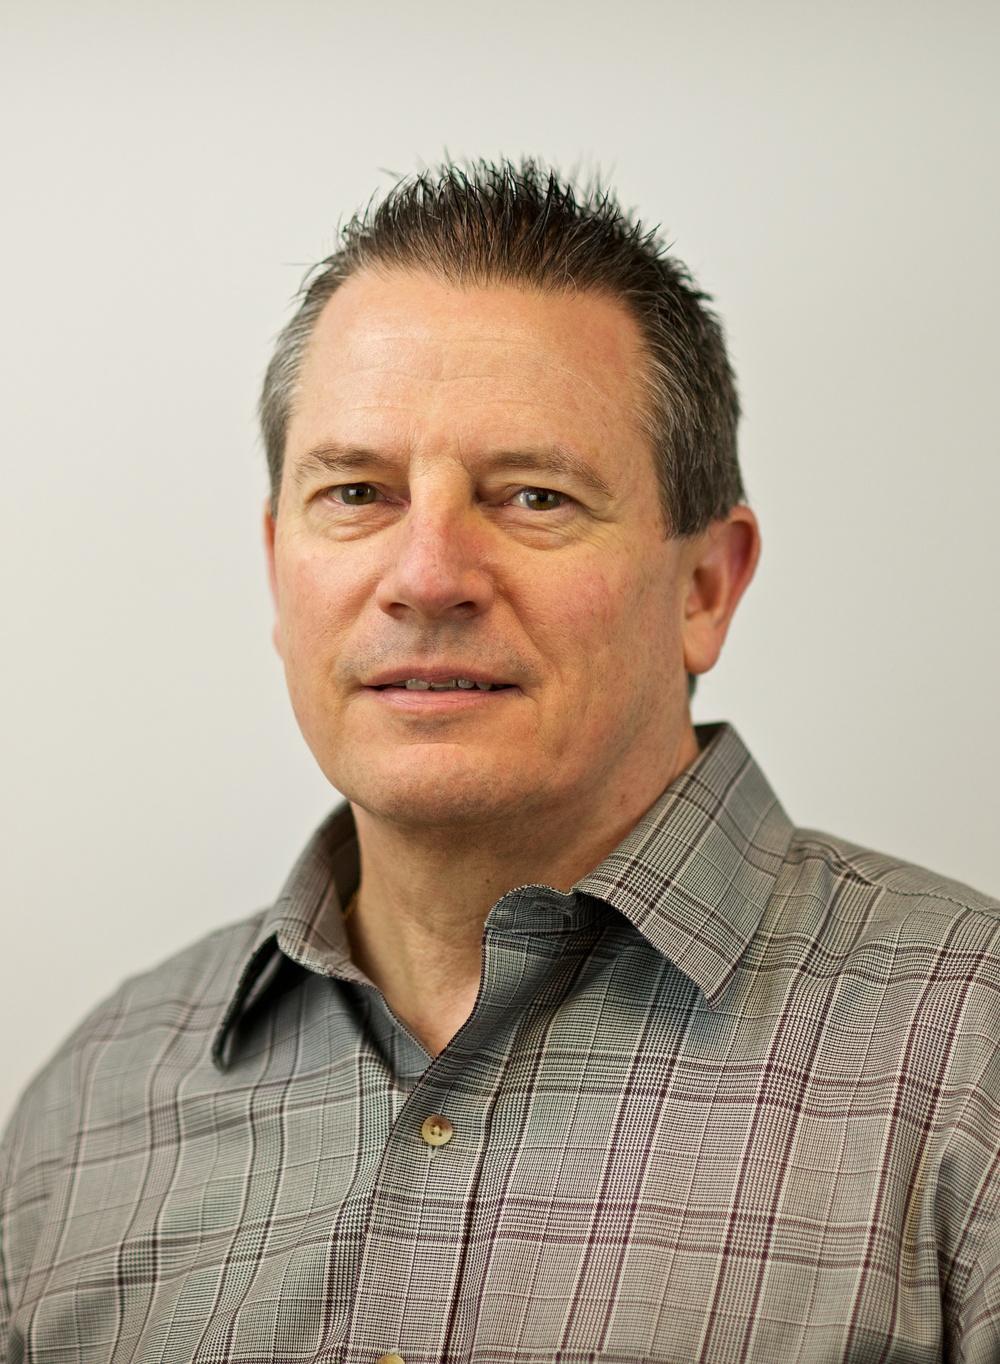 Craig Chreene